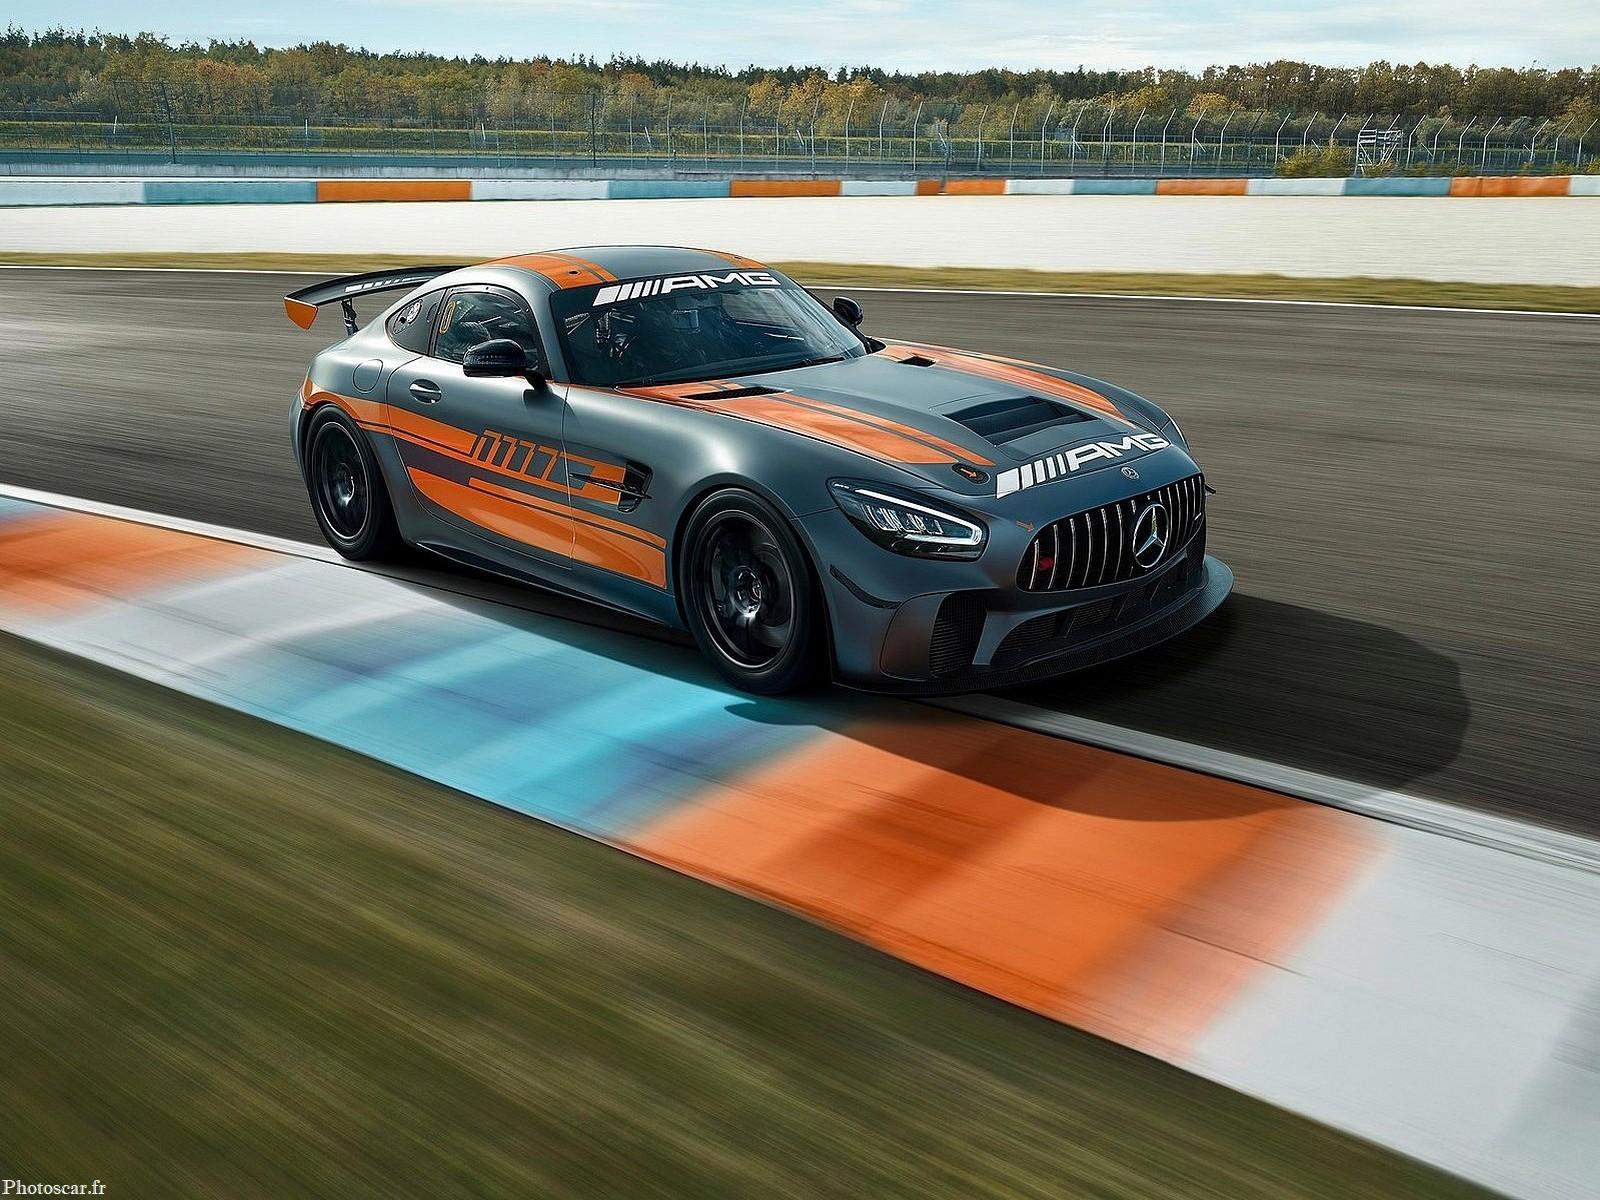 Mercedes-AMG GT4 2020